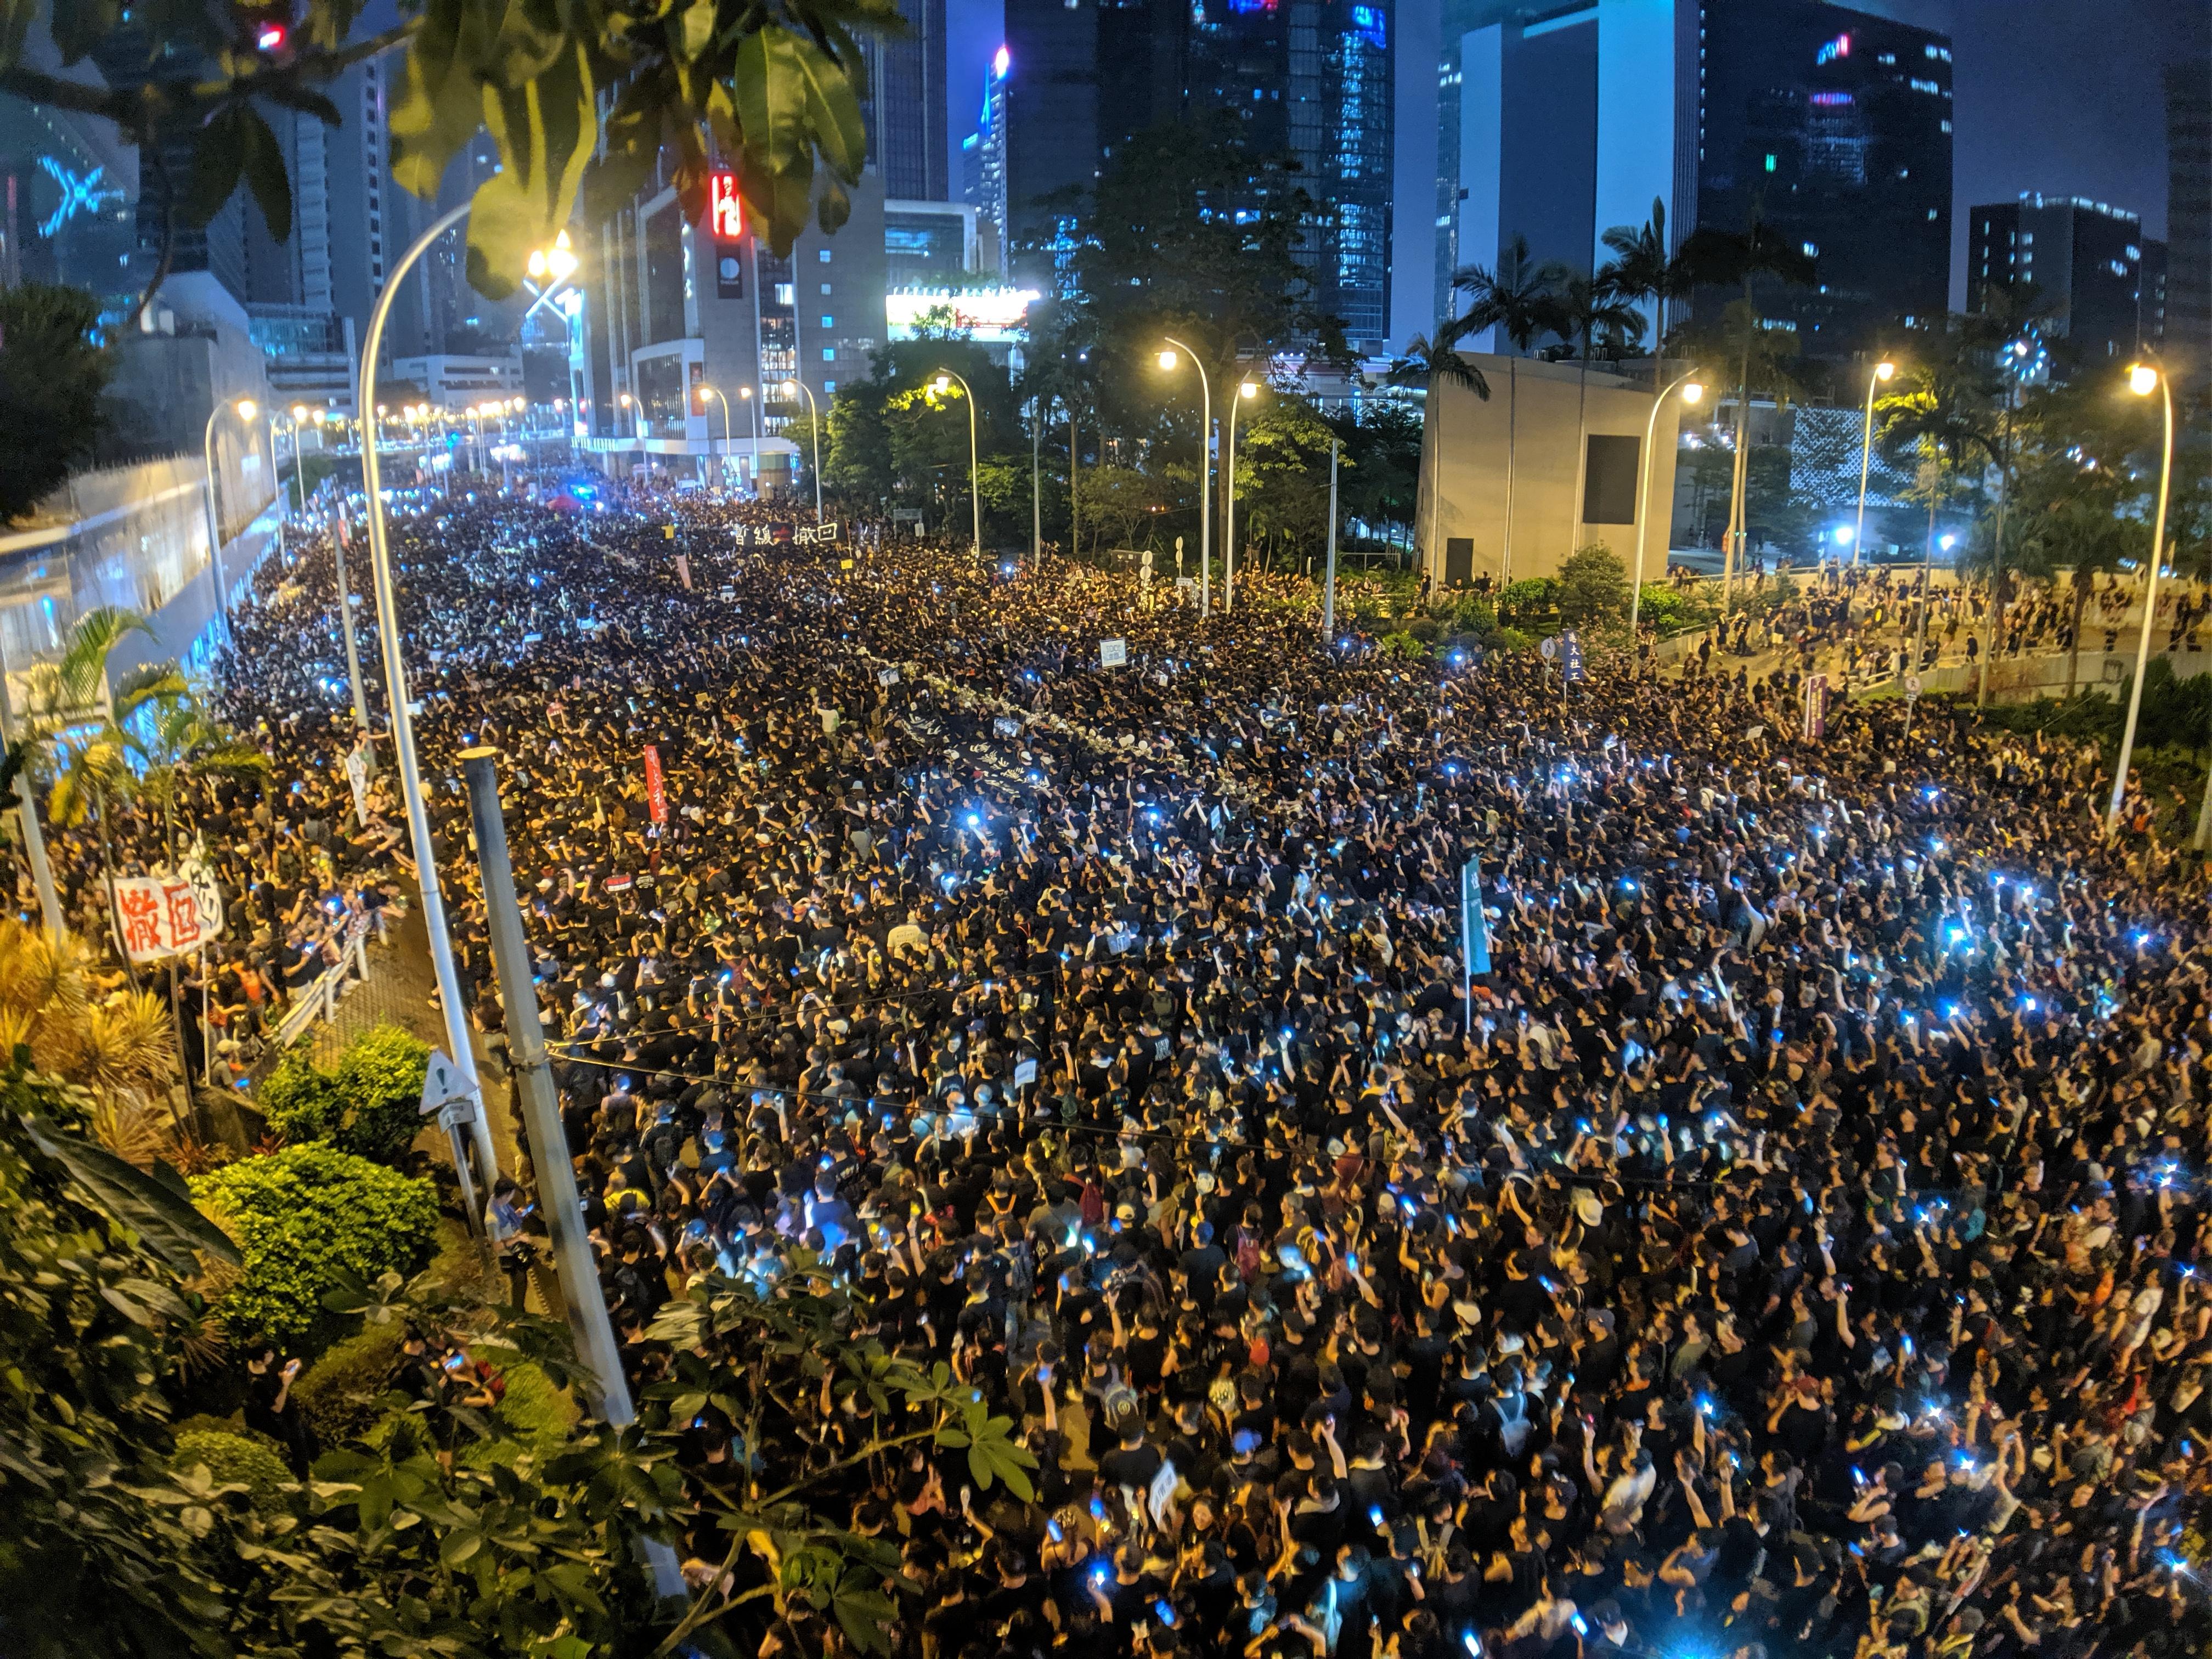 File:190616 HK Protest Incendo 16.jpg